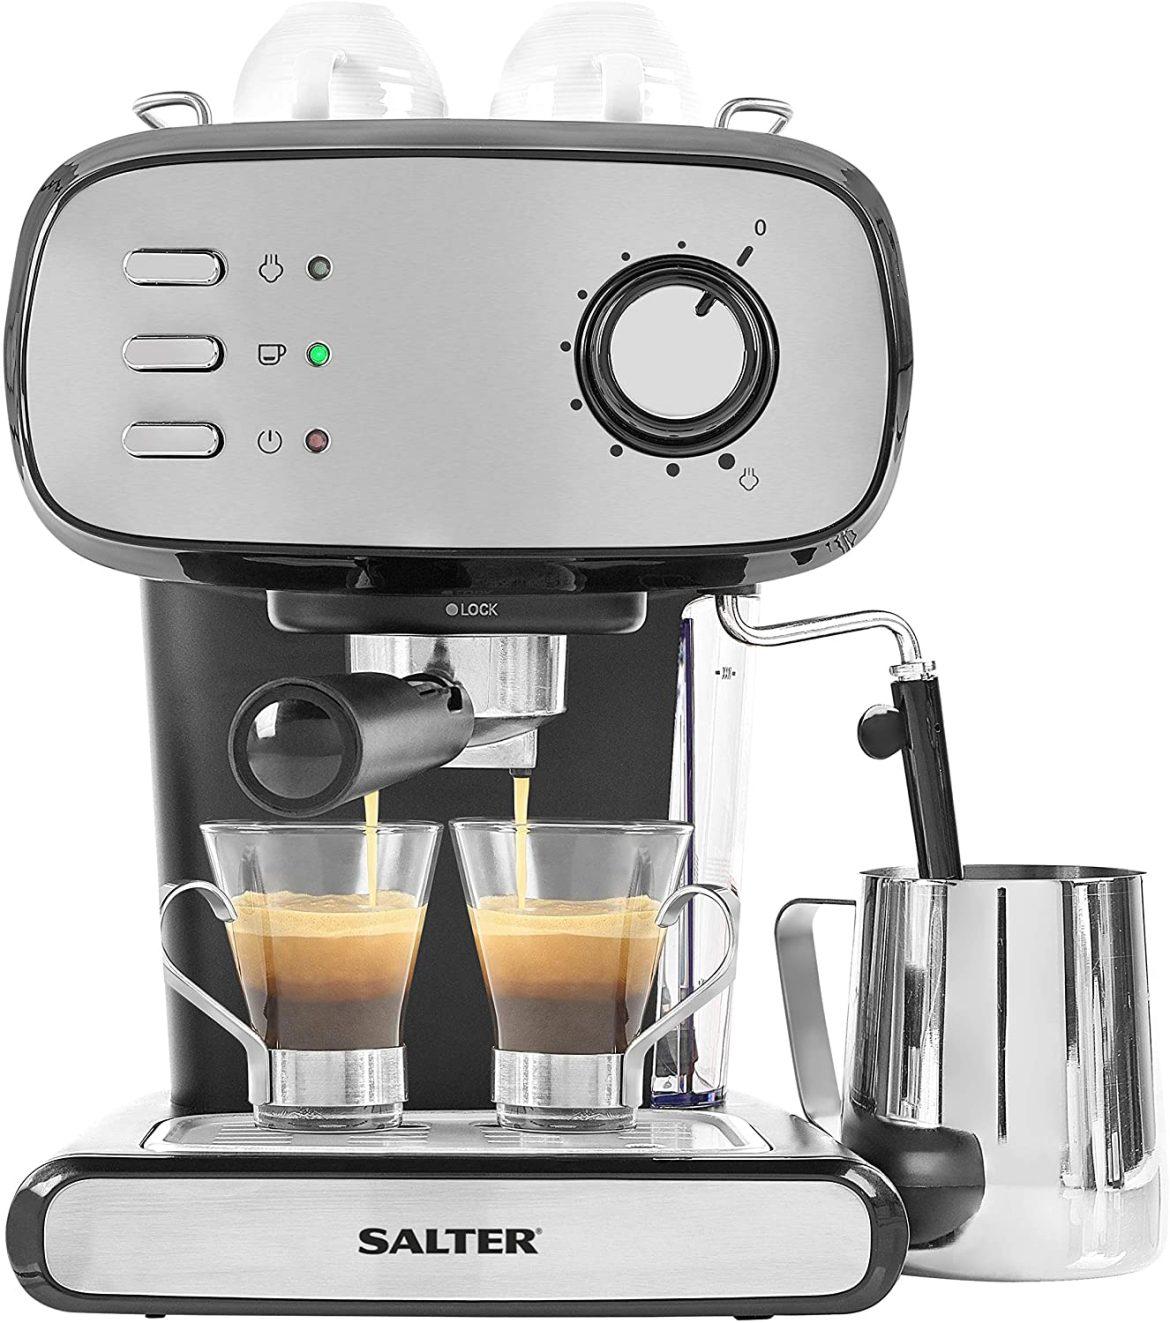 Save £57 on the new Salter Caffe Barista Pro espresso maker